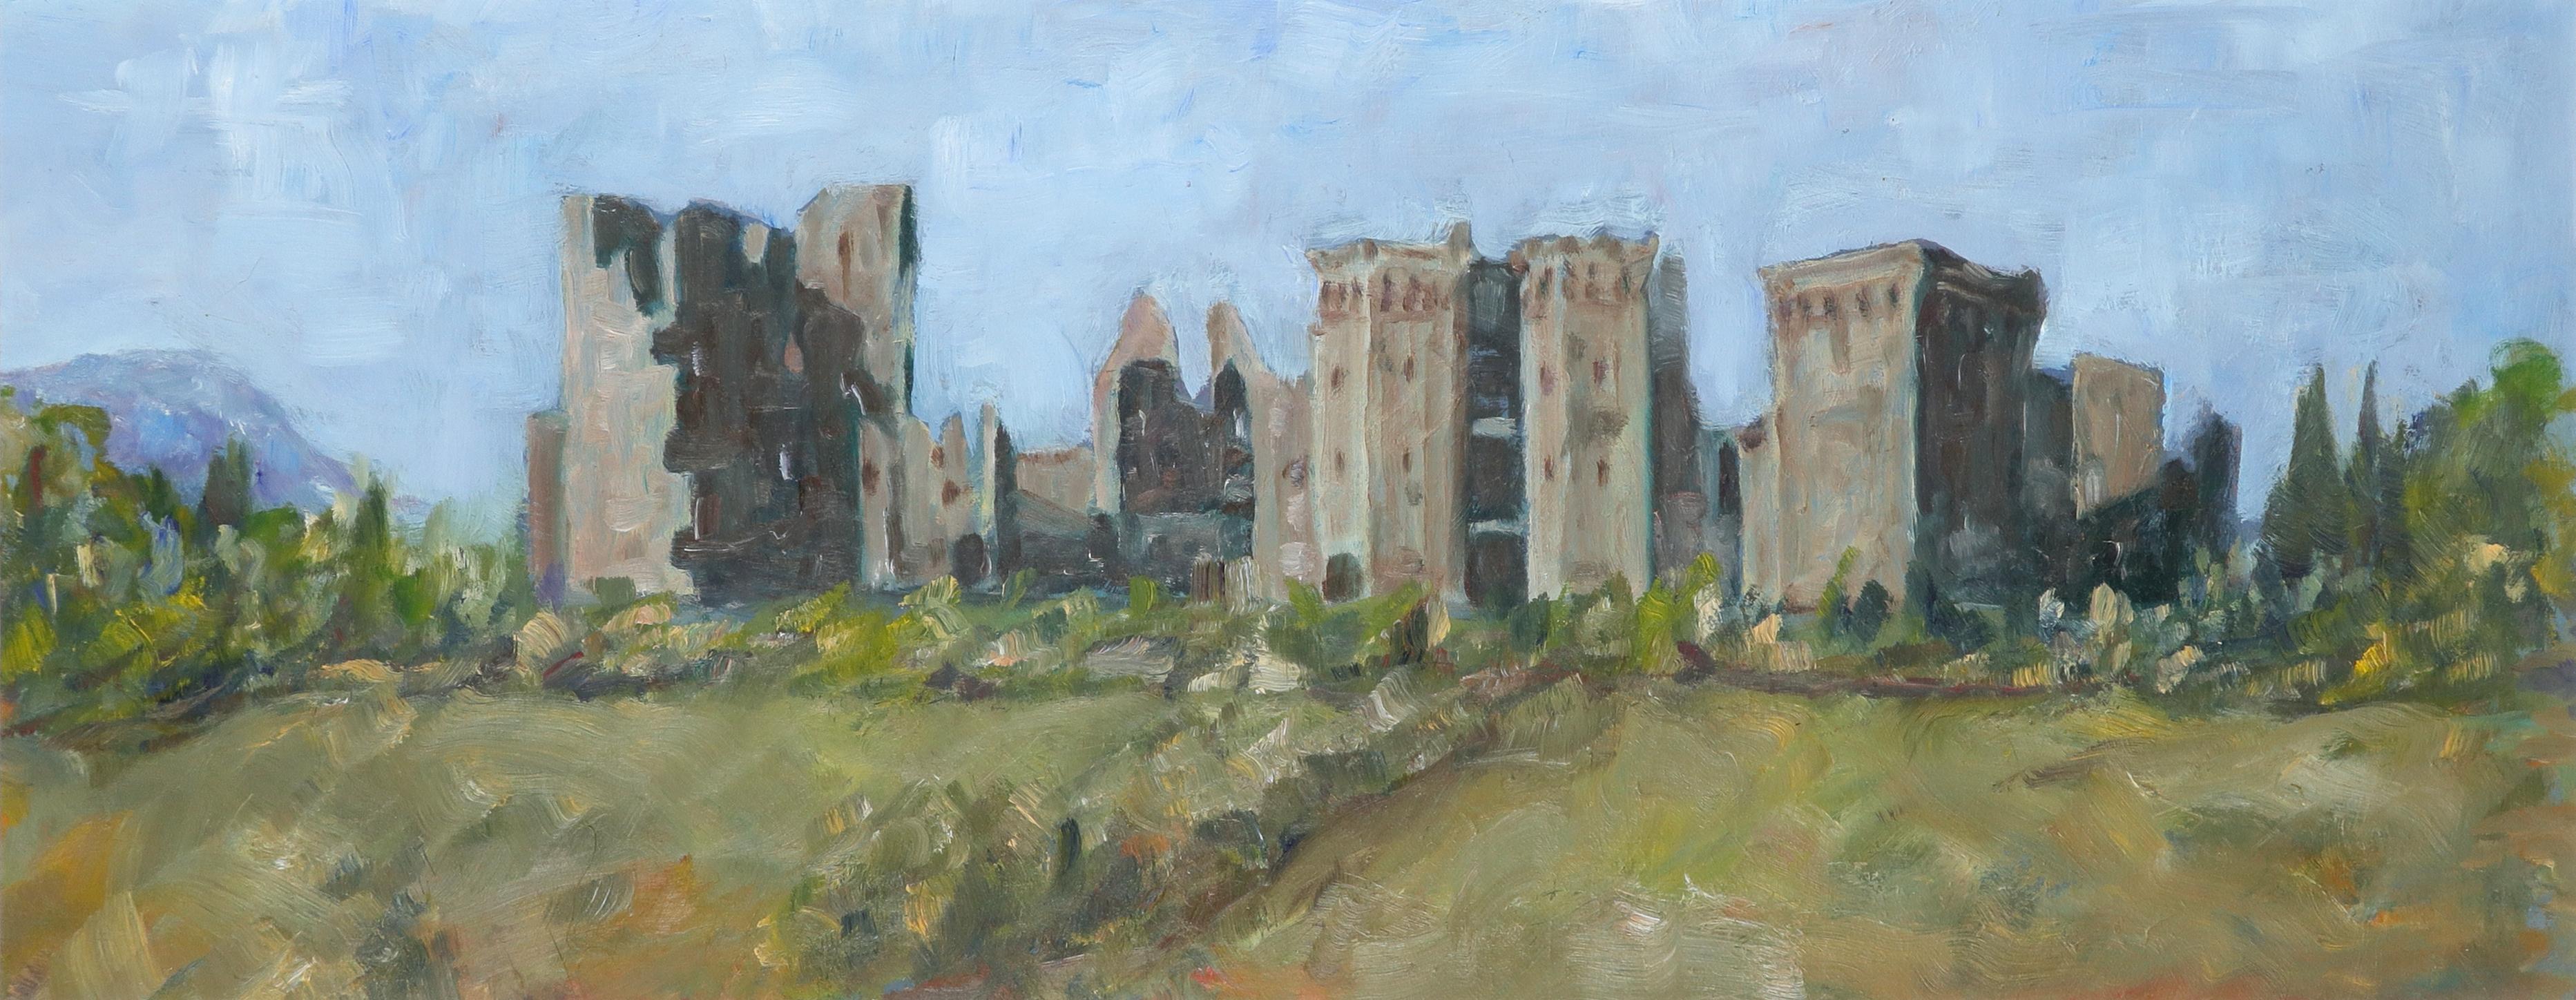 ‡Michael Clark (Contemporary) Raglan Castle, Monmouthshire Oil on card 22 x 57cm Unframed